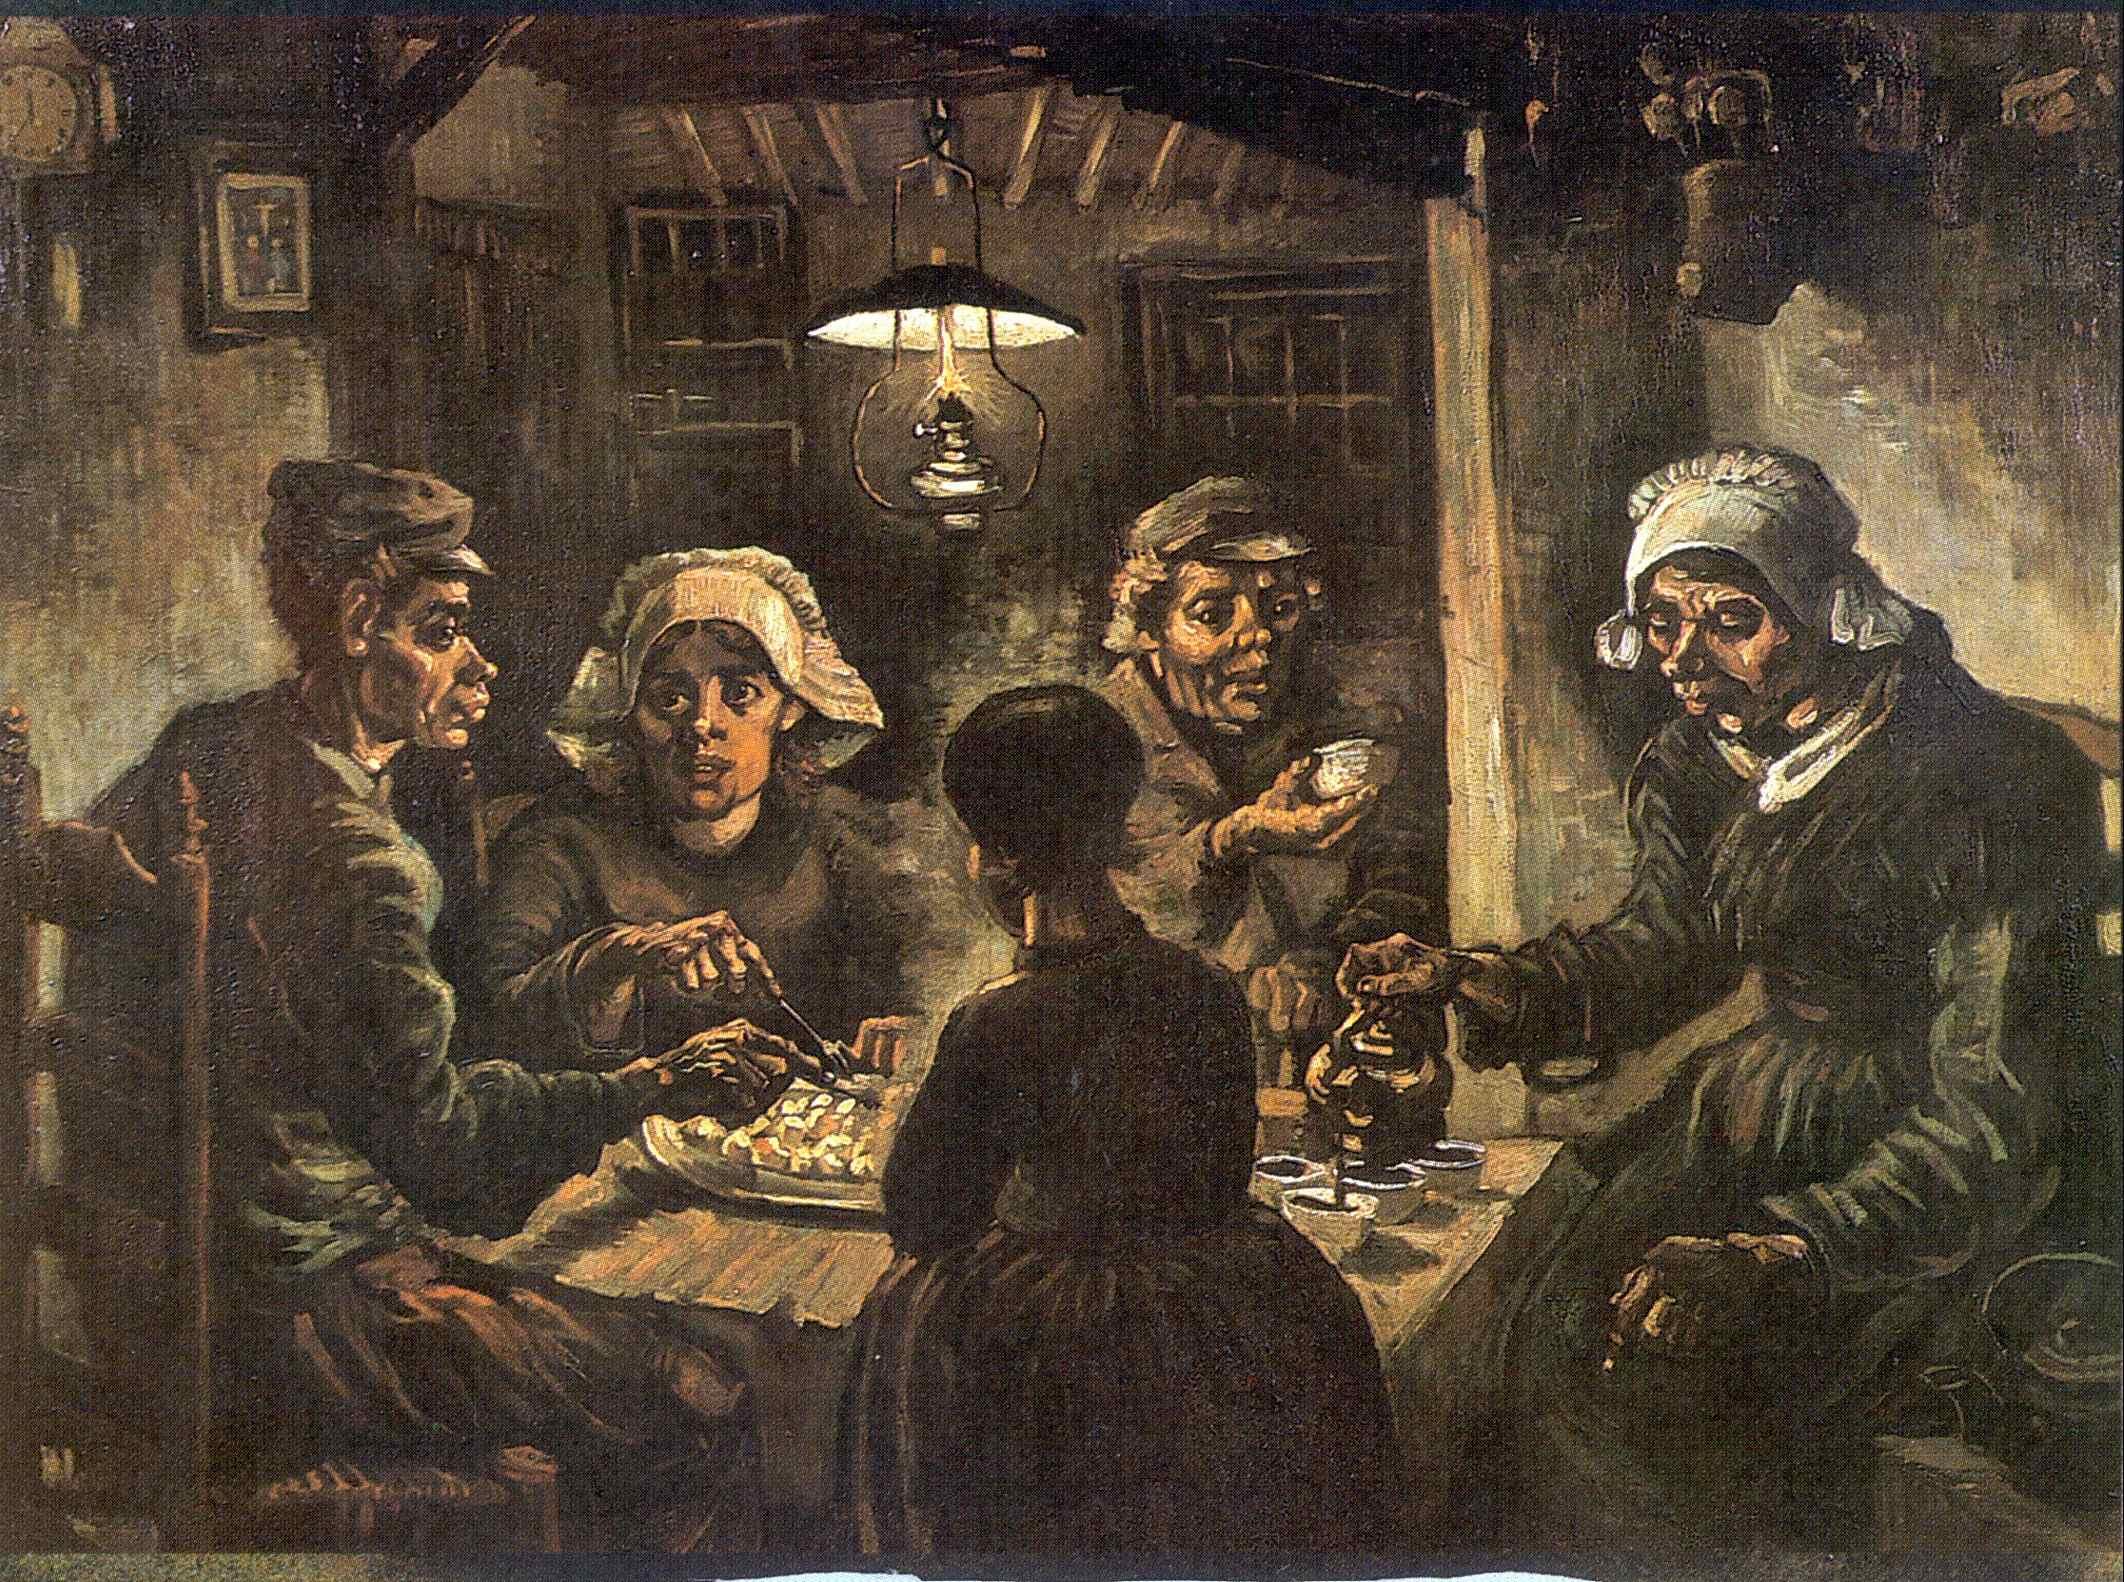 Baggermans-Gogh-09